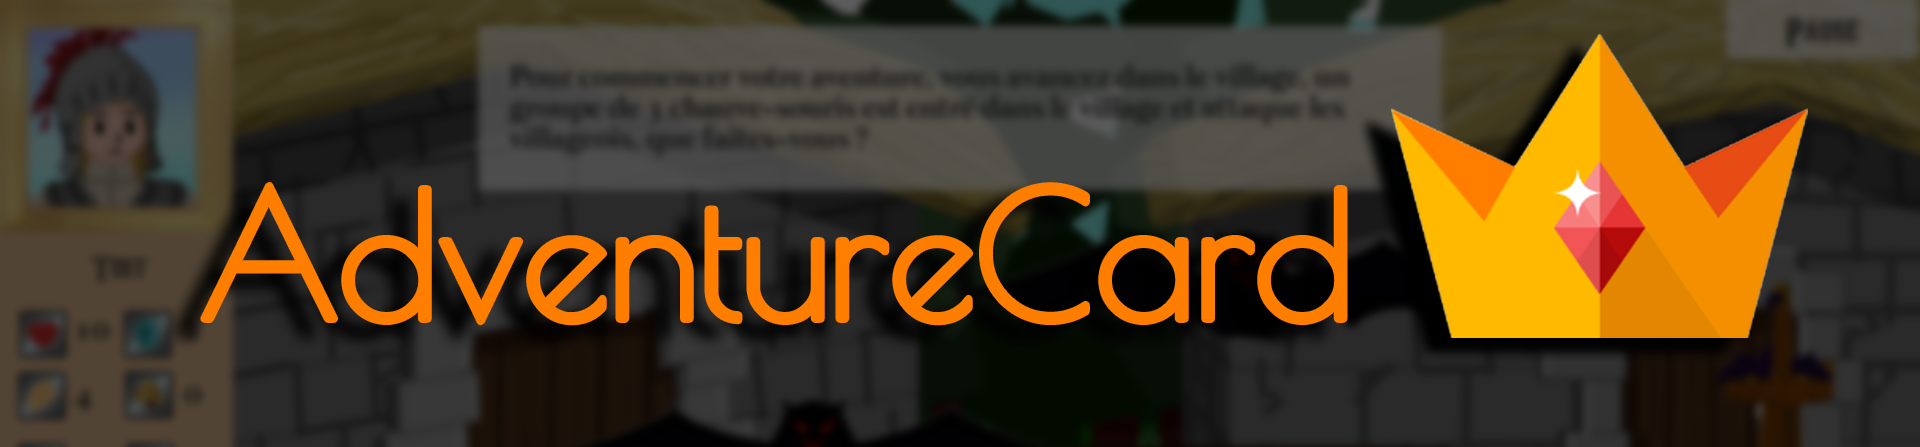 AdventureCard